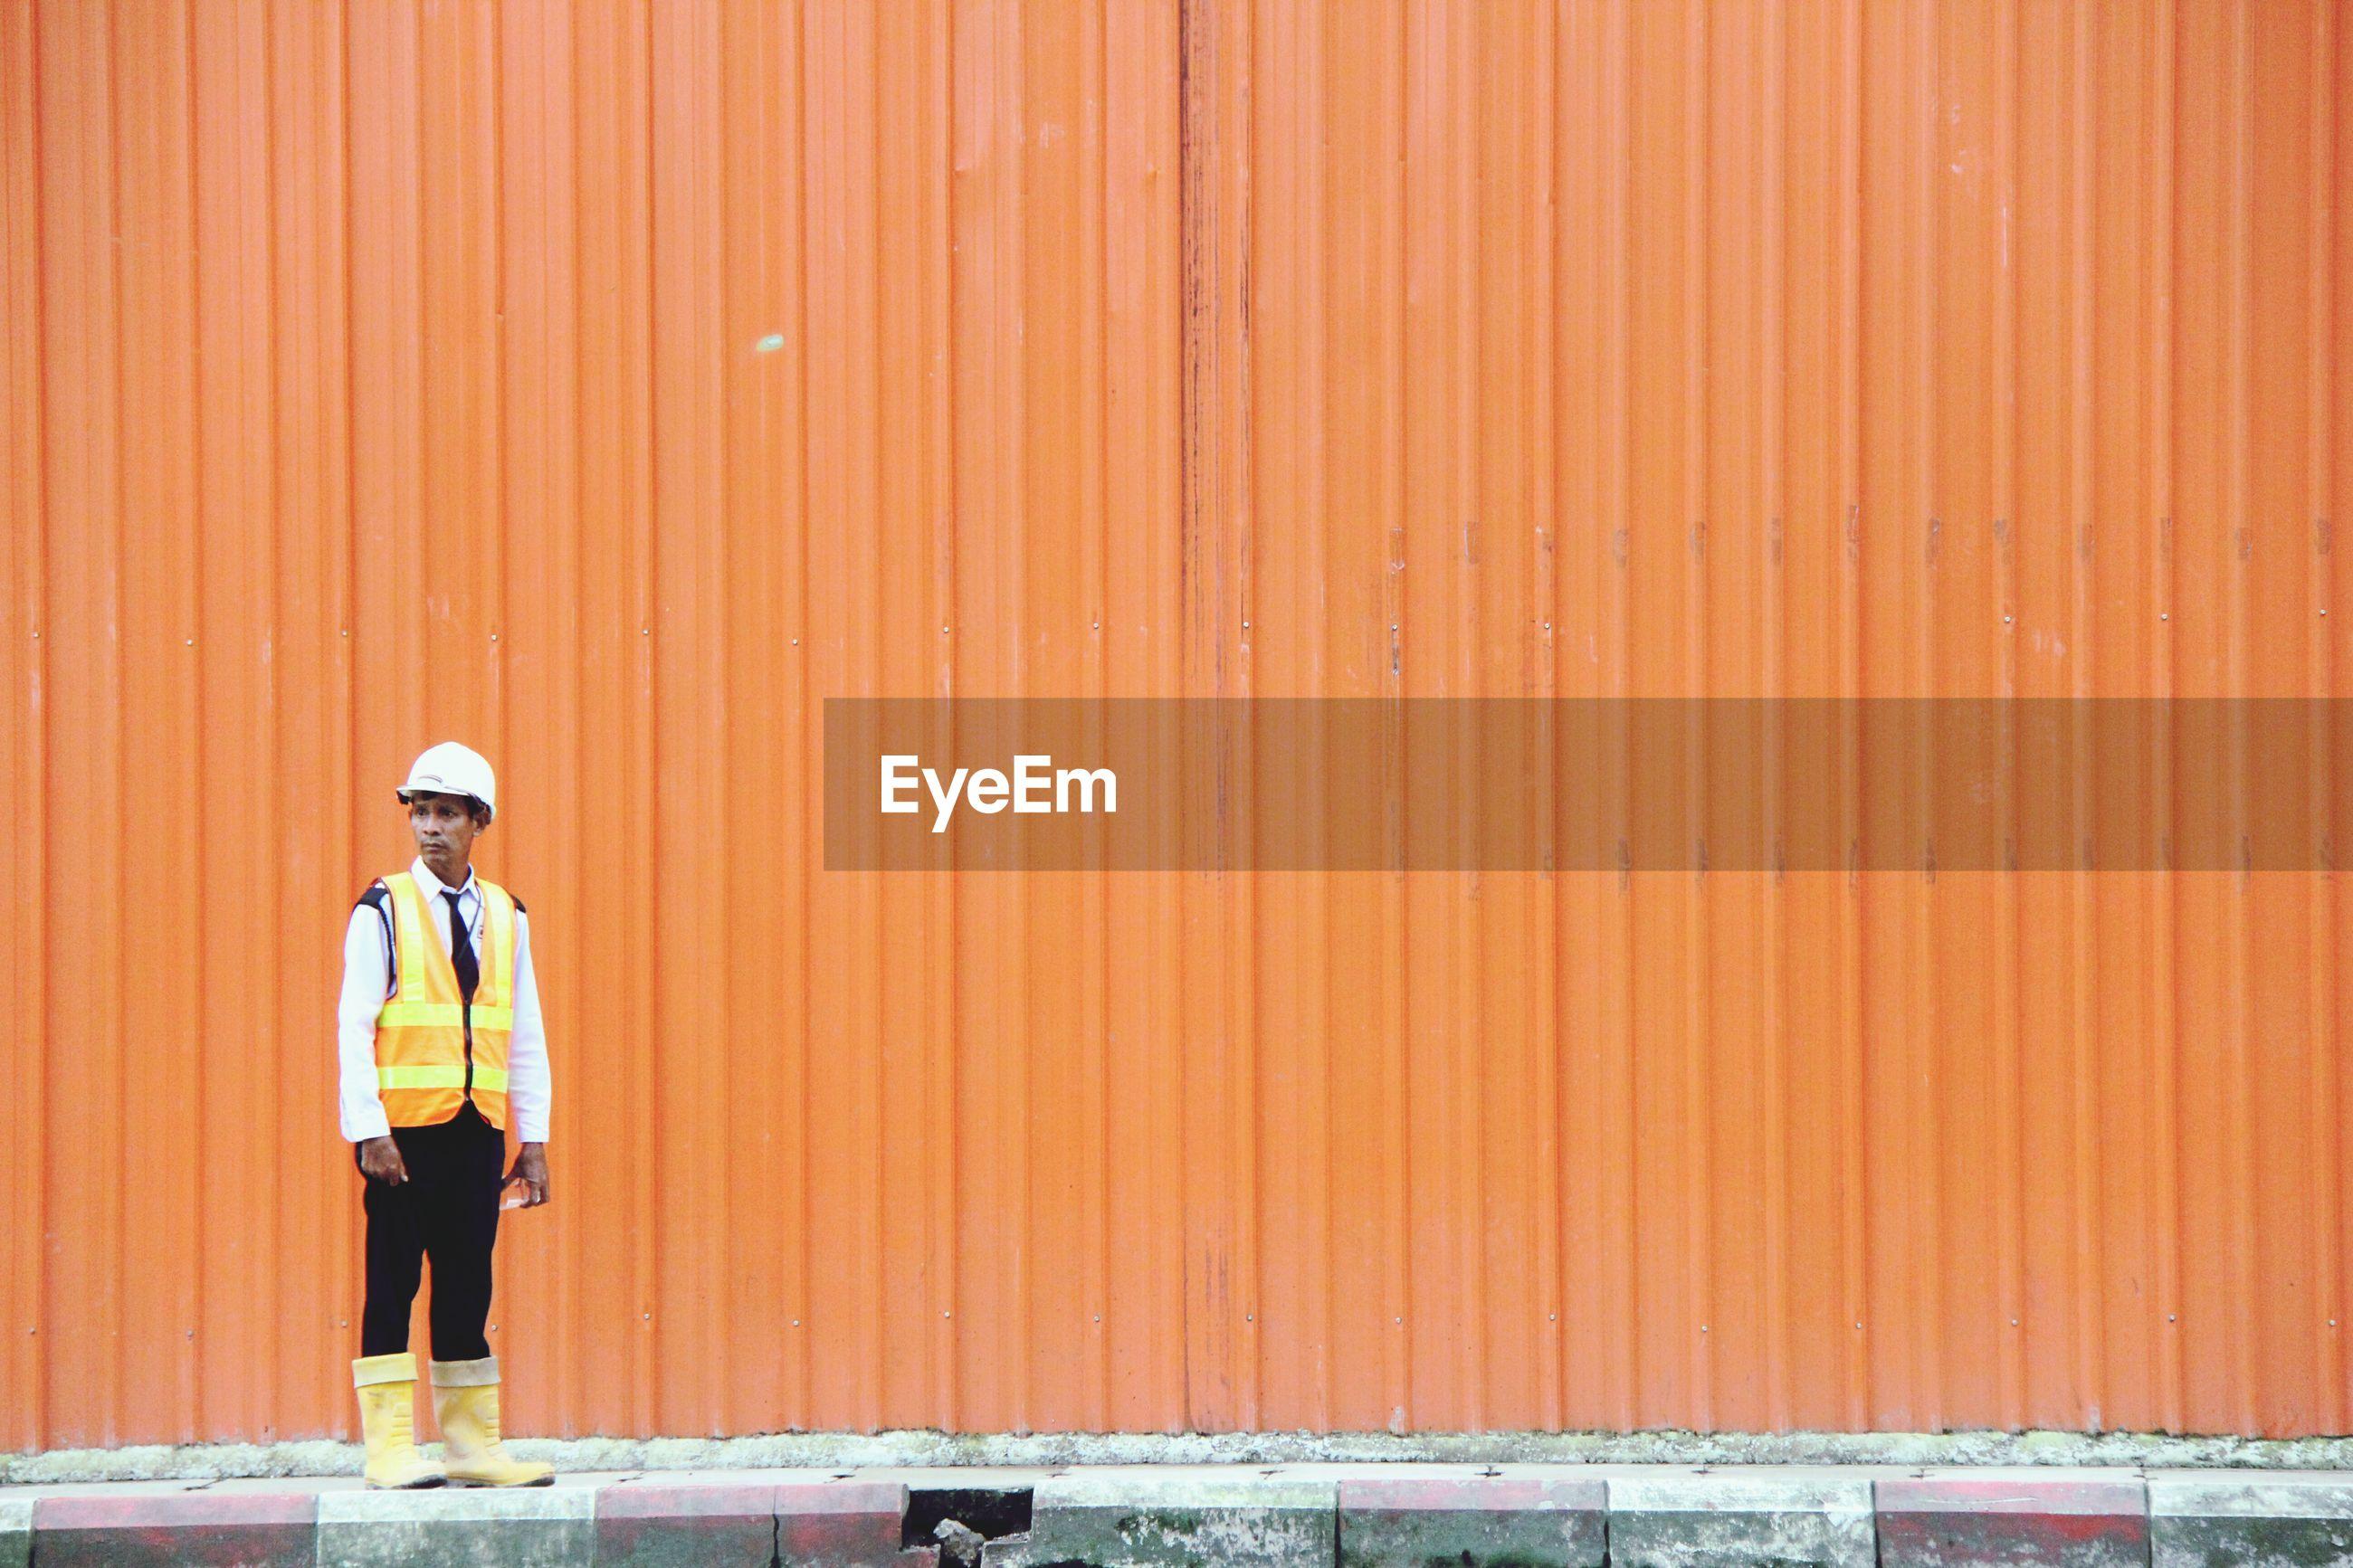 Manual worker wearing reflective clothing and hardhat standing against orange corrugated iron